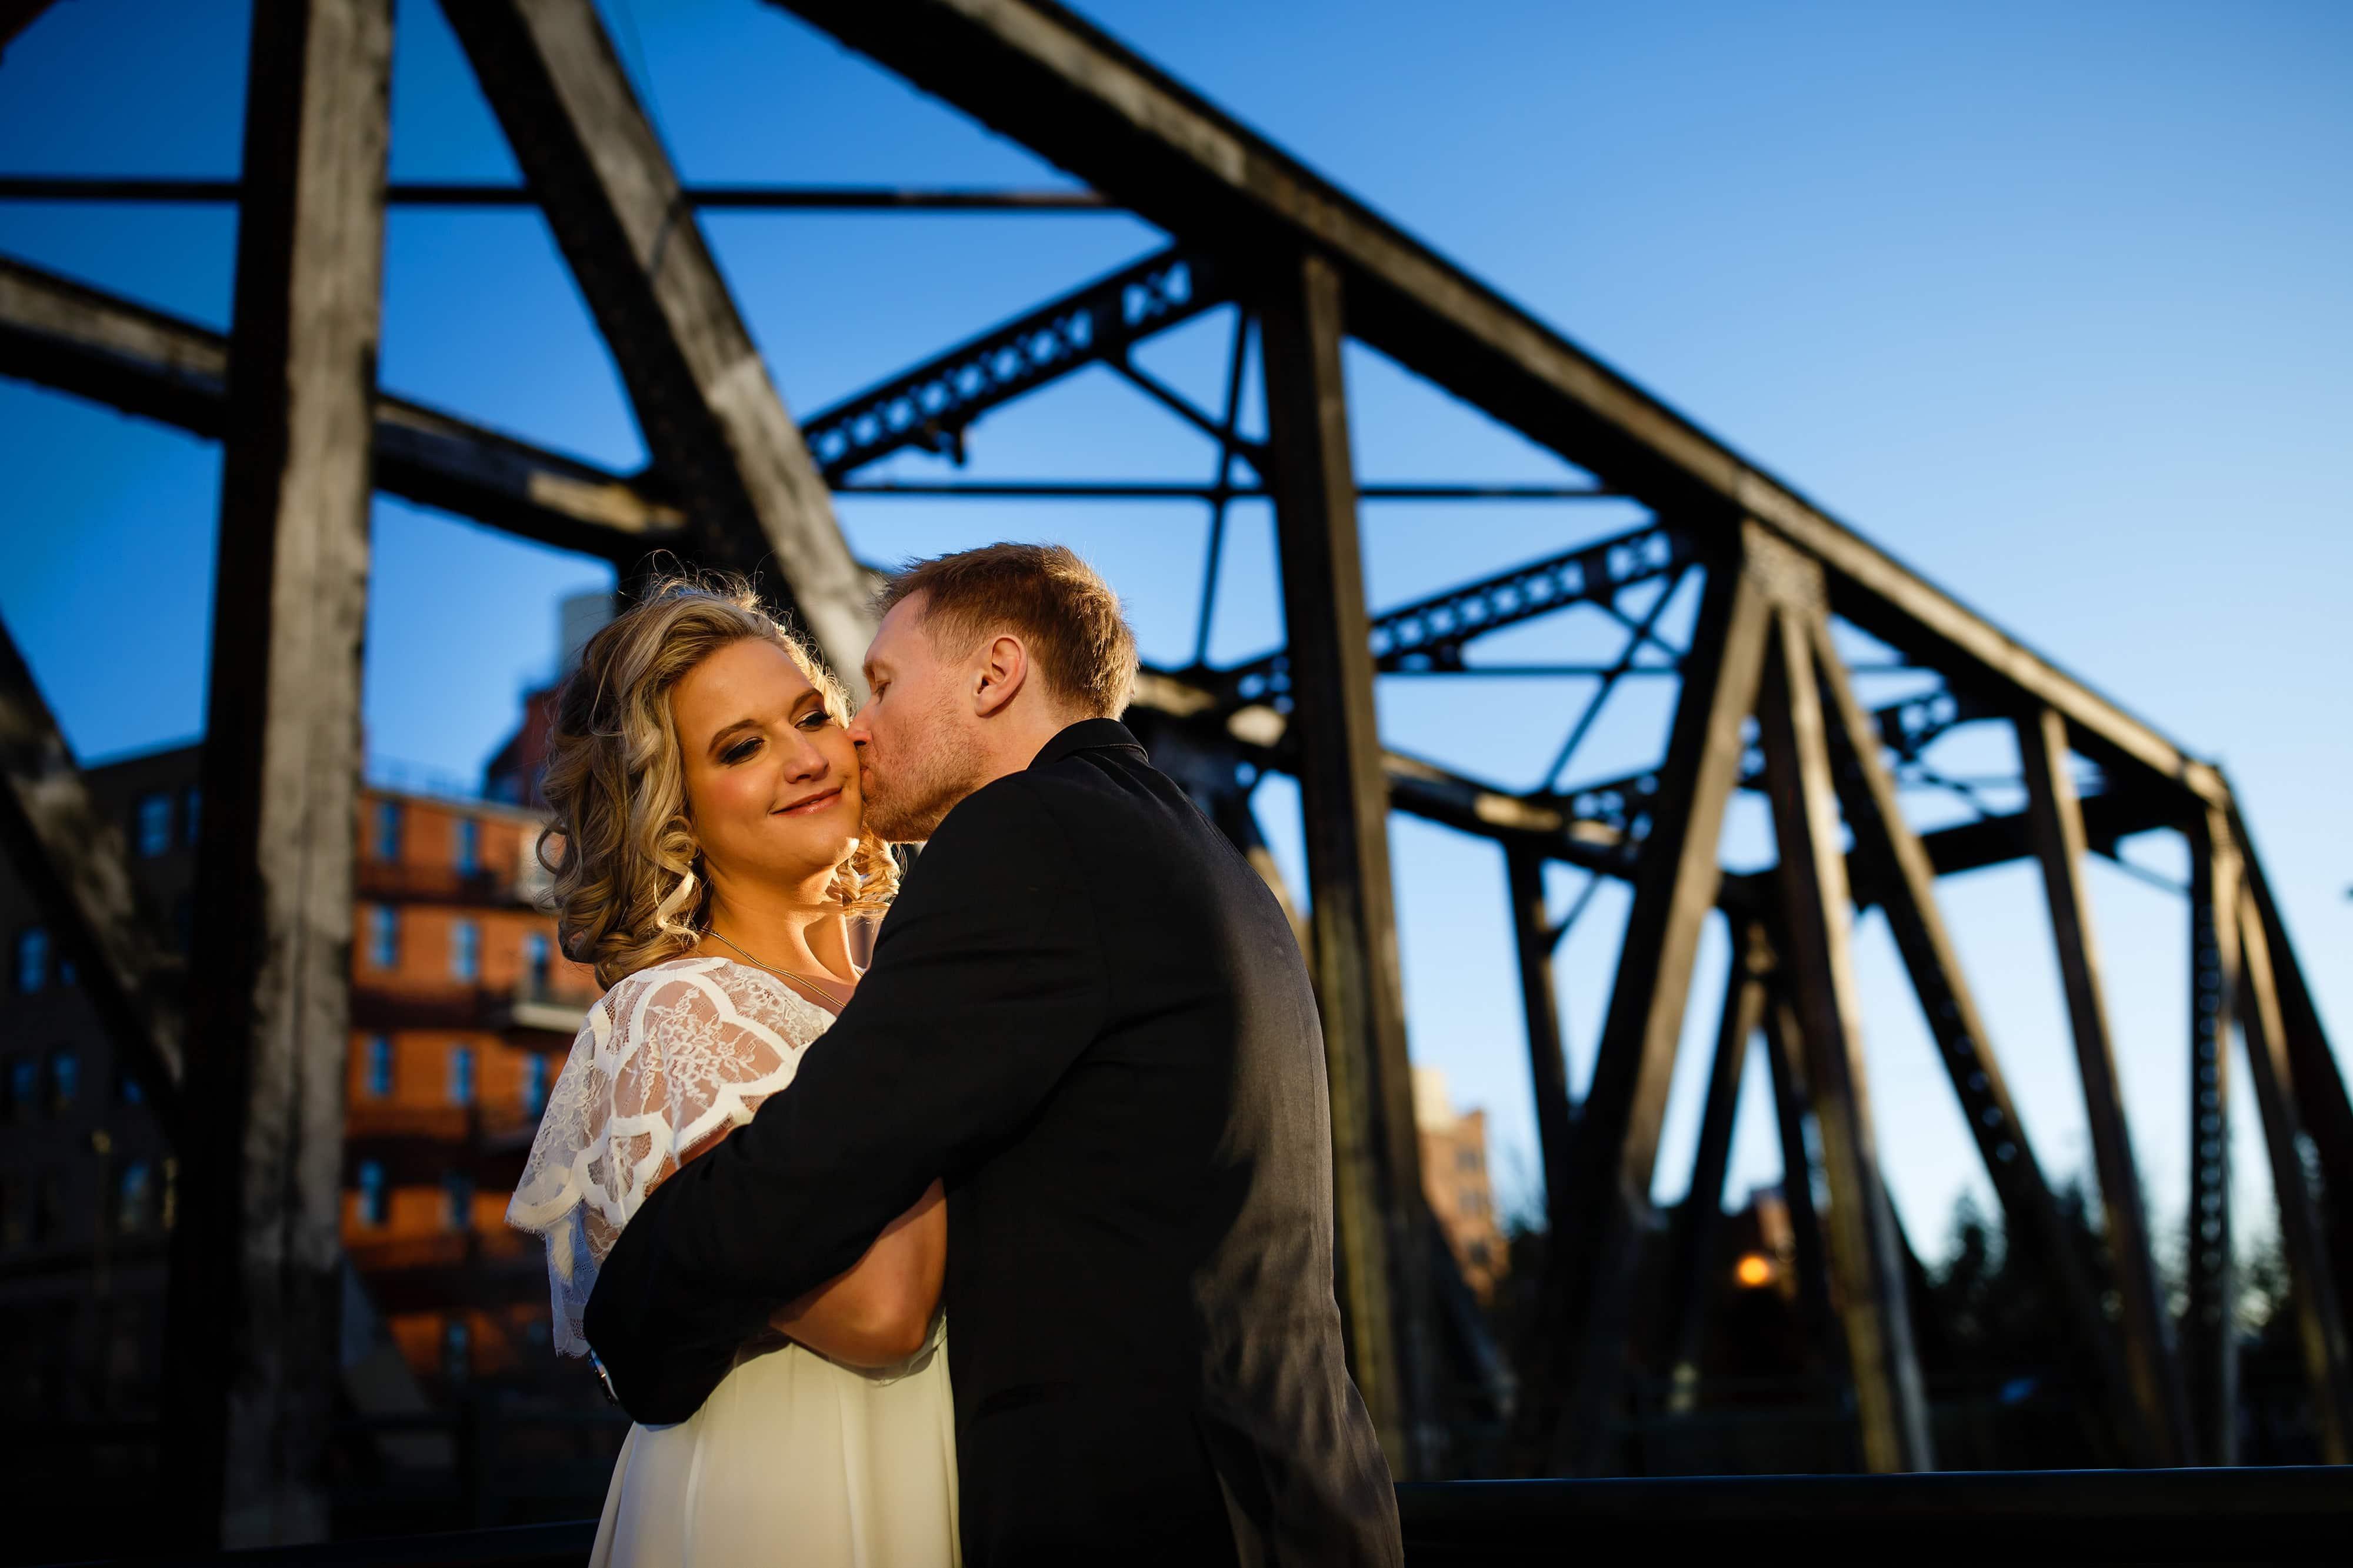 Ryan kisses Sarah on the cheek in front of the Wynkoop Street bridge after their wedding in Denver